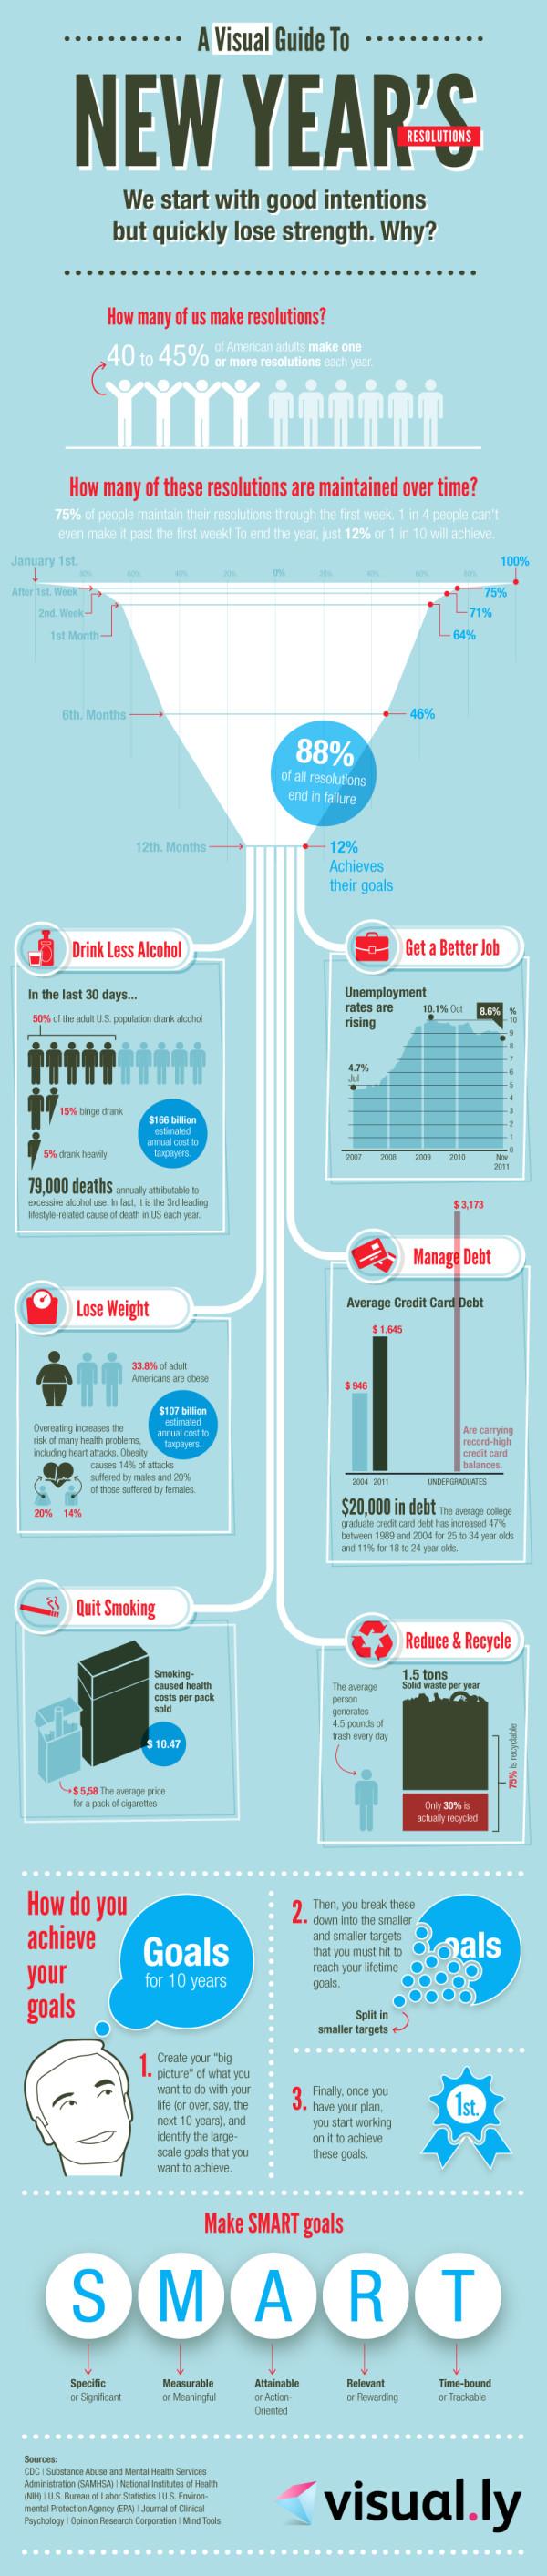 gute vorsätze, infografik